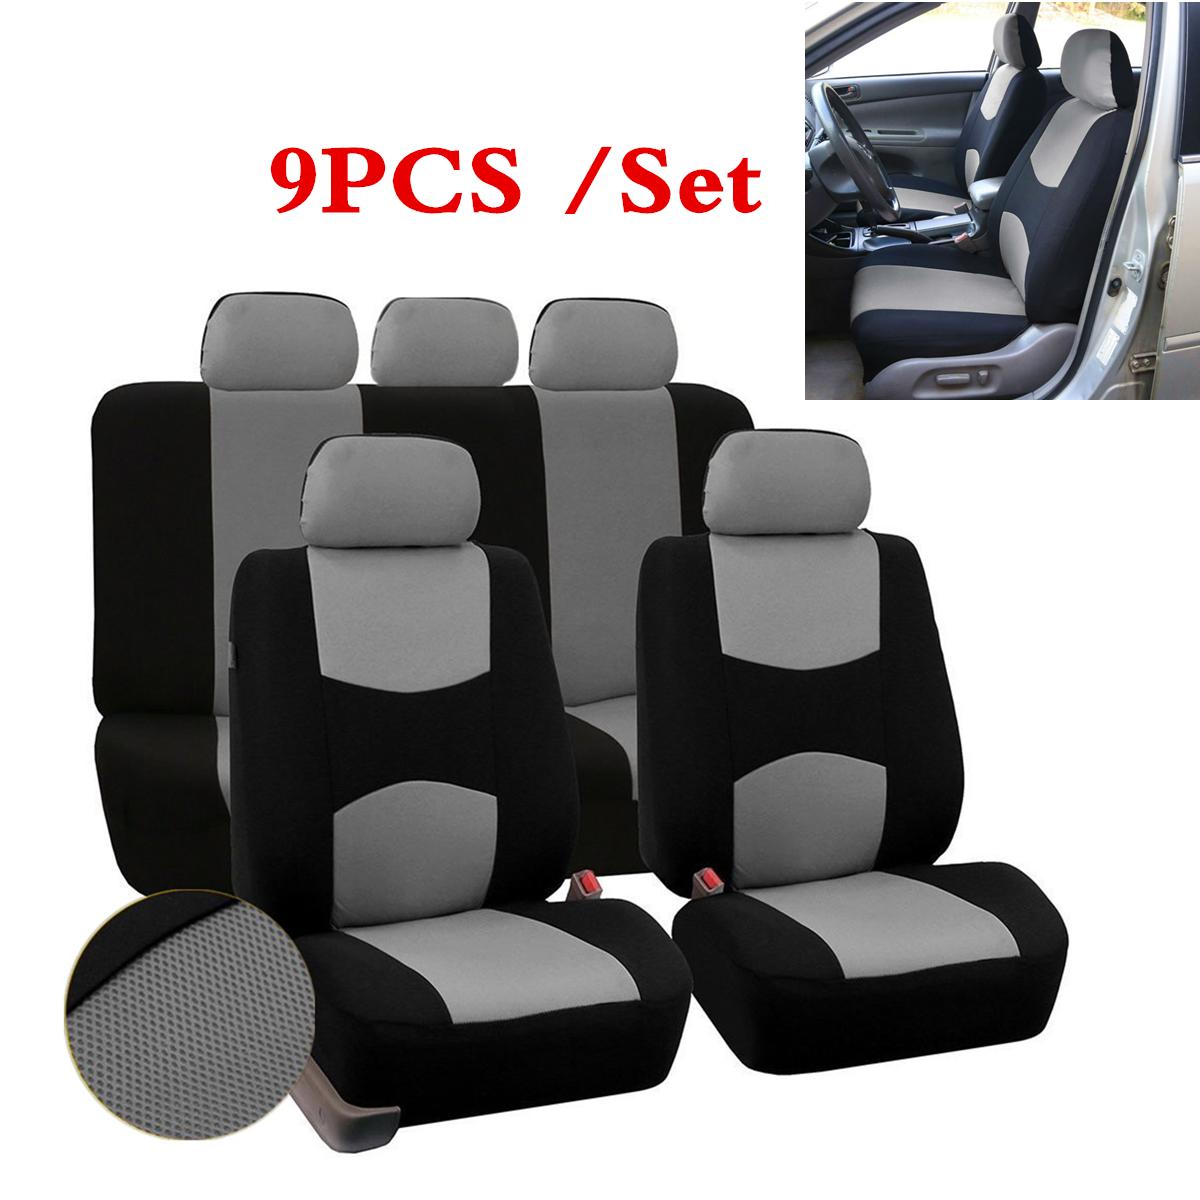 Big lots car seat covers rafter connectors